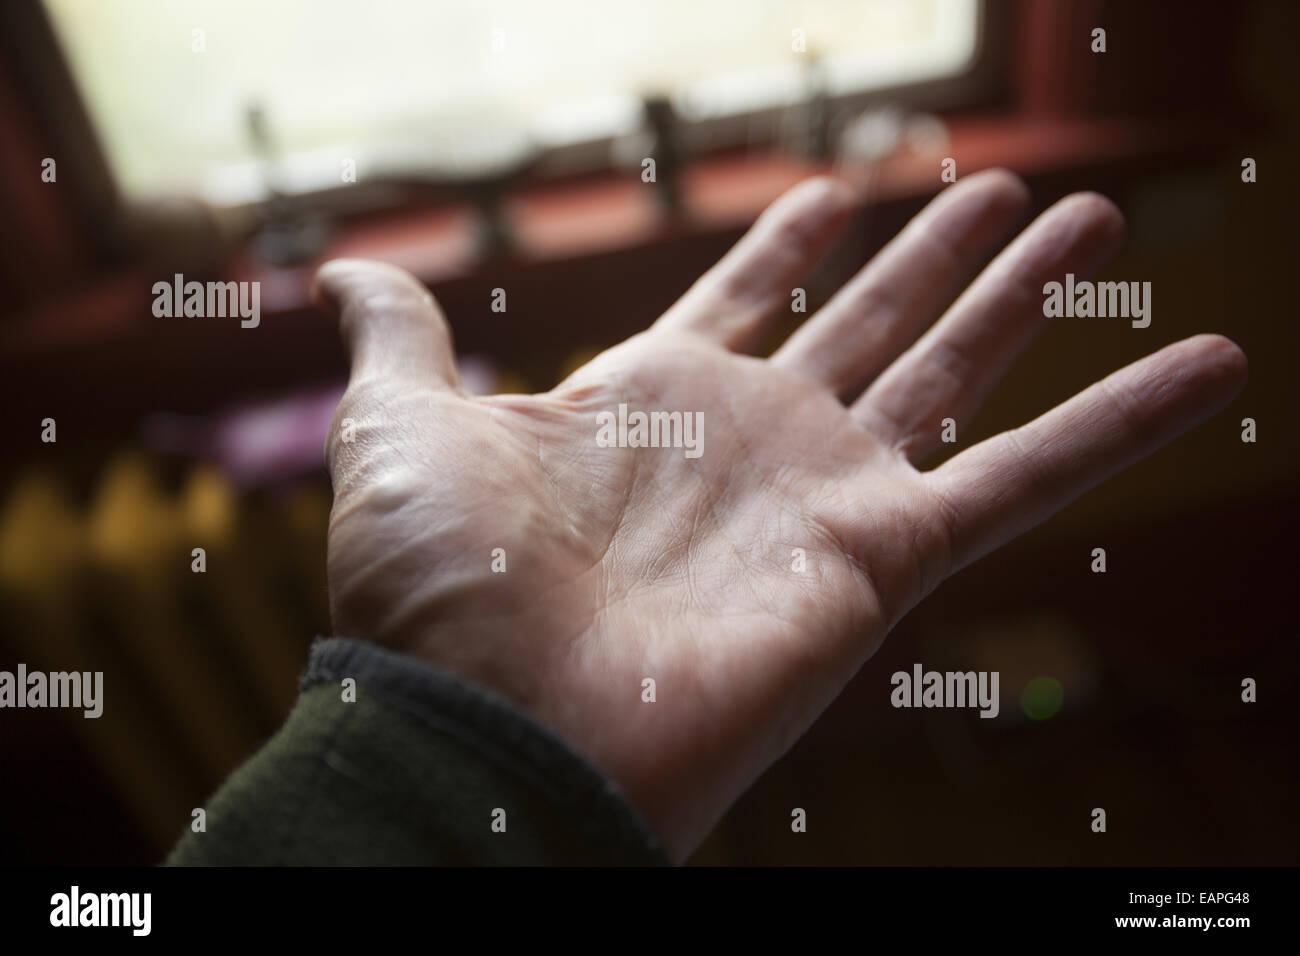 Man's open left hand. - Stock Image